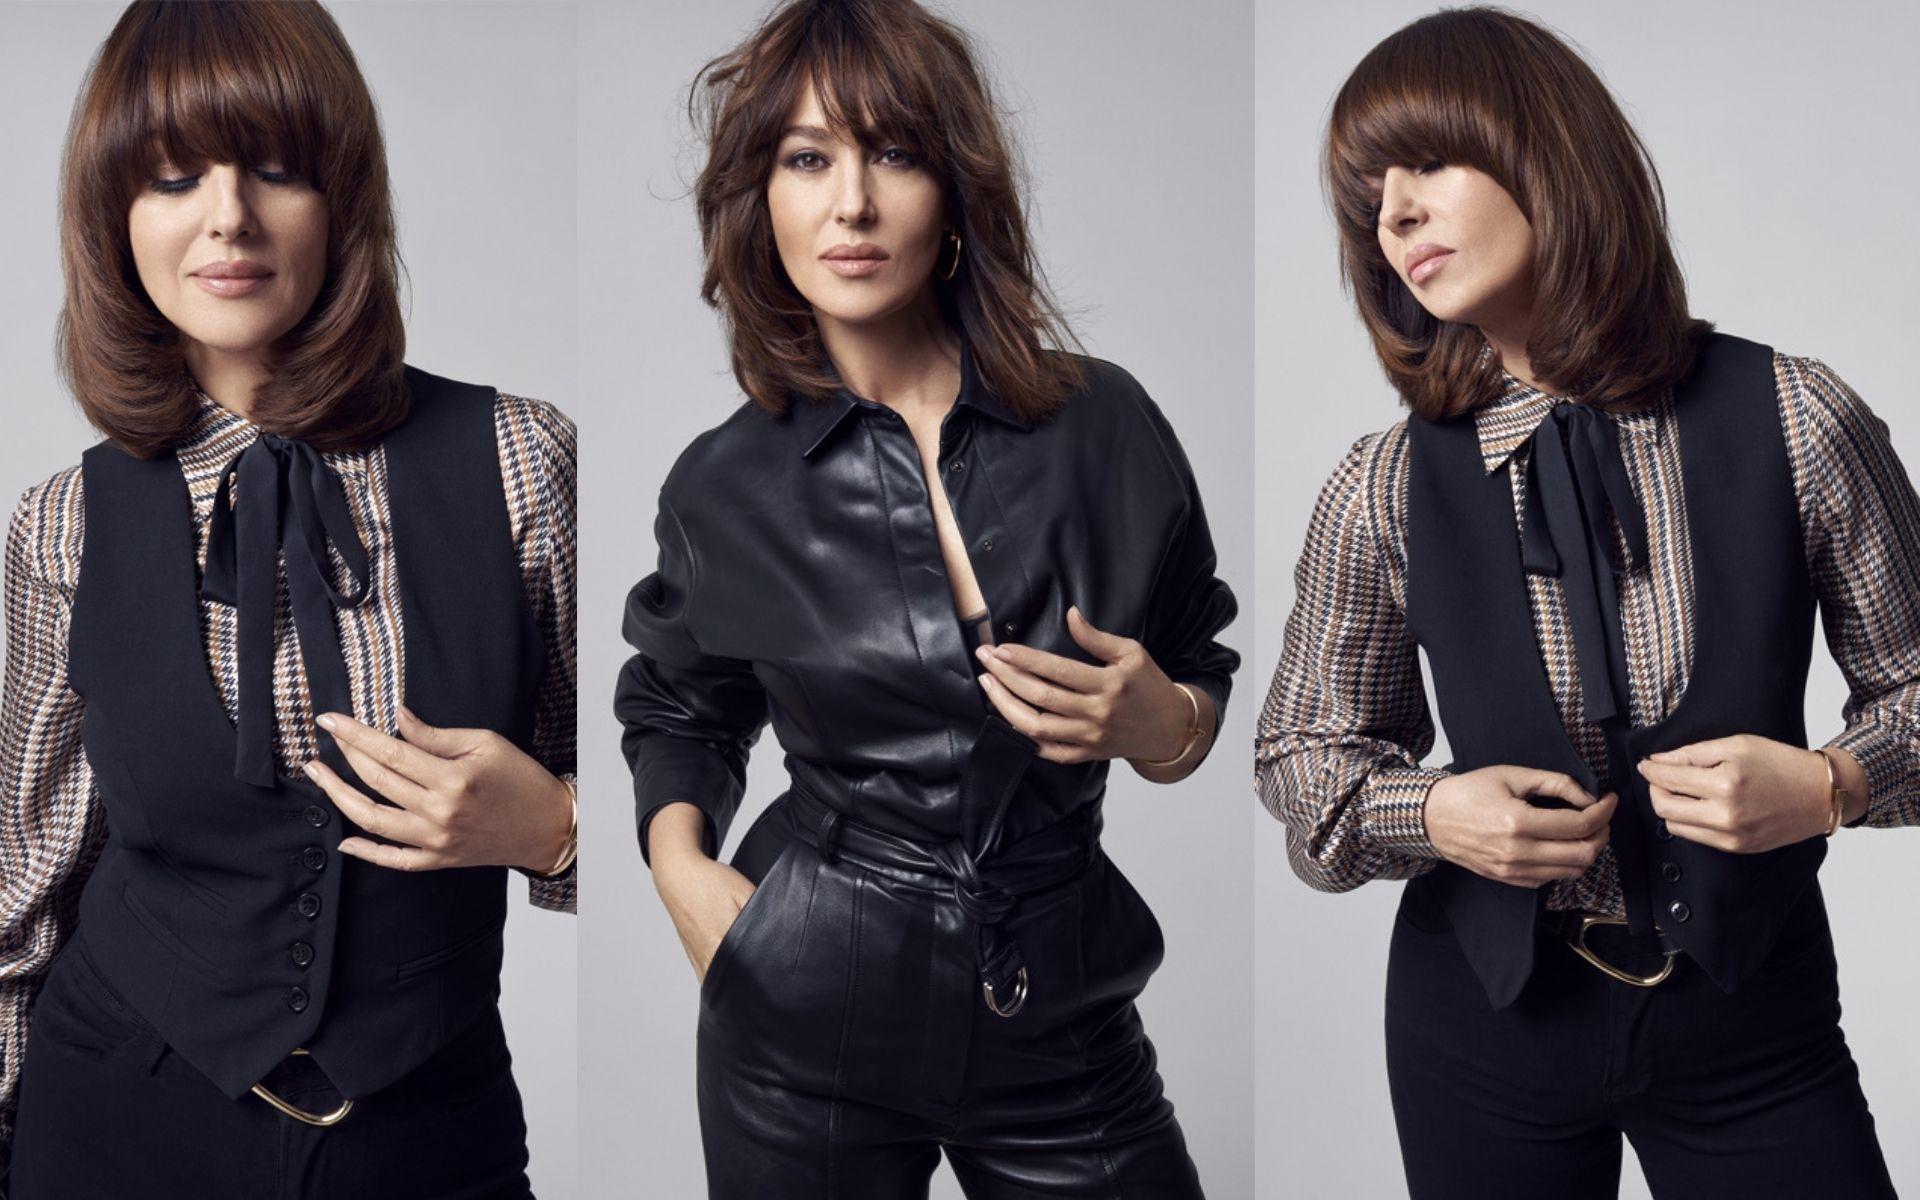 Monica Bellucci Dazzles In Cartiers Iconic Love and Juste un Clou 1920x1200